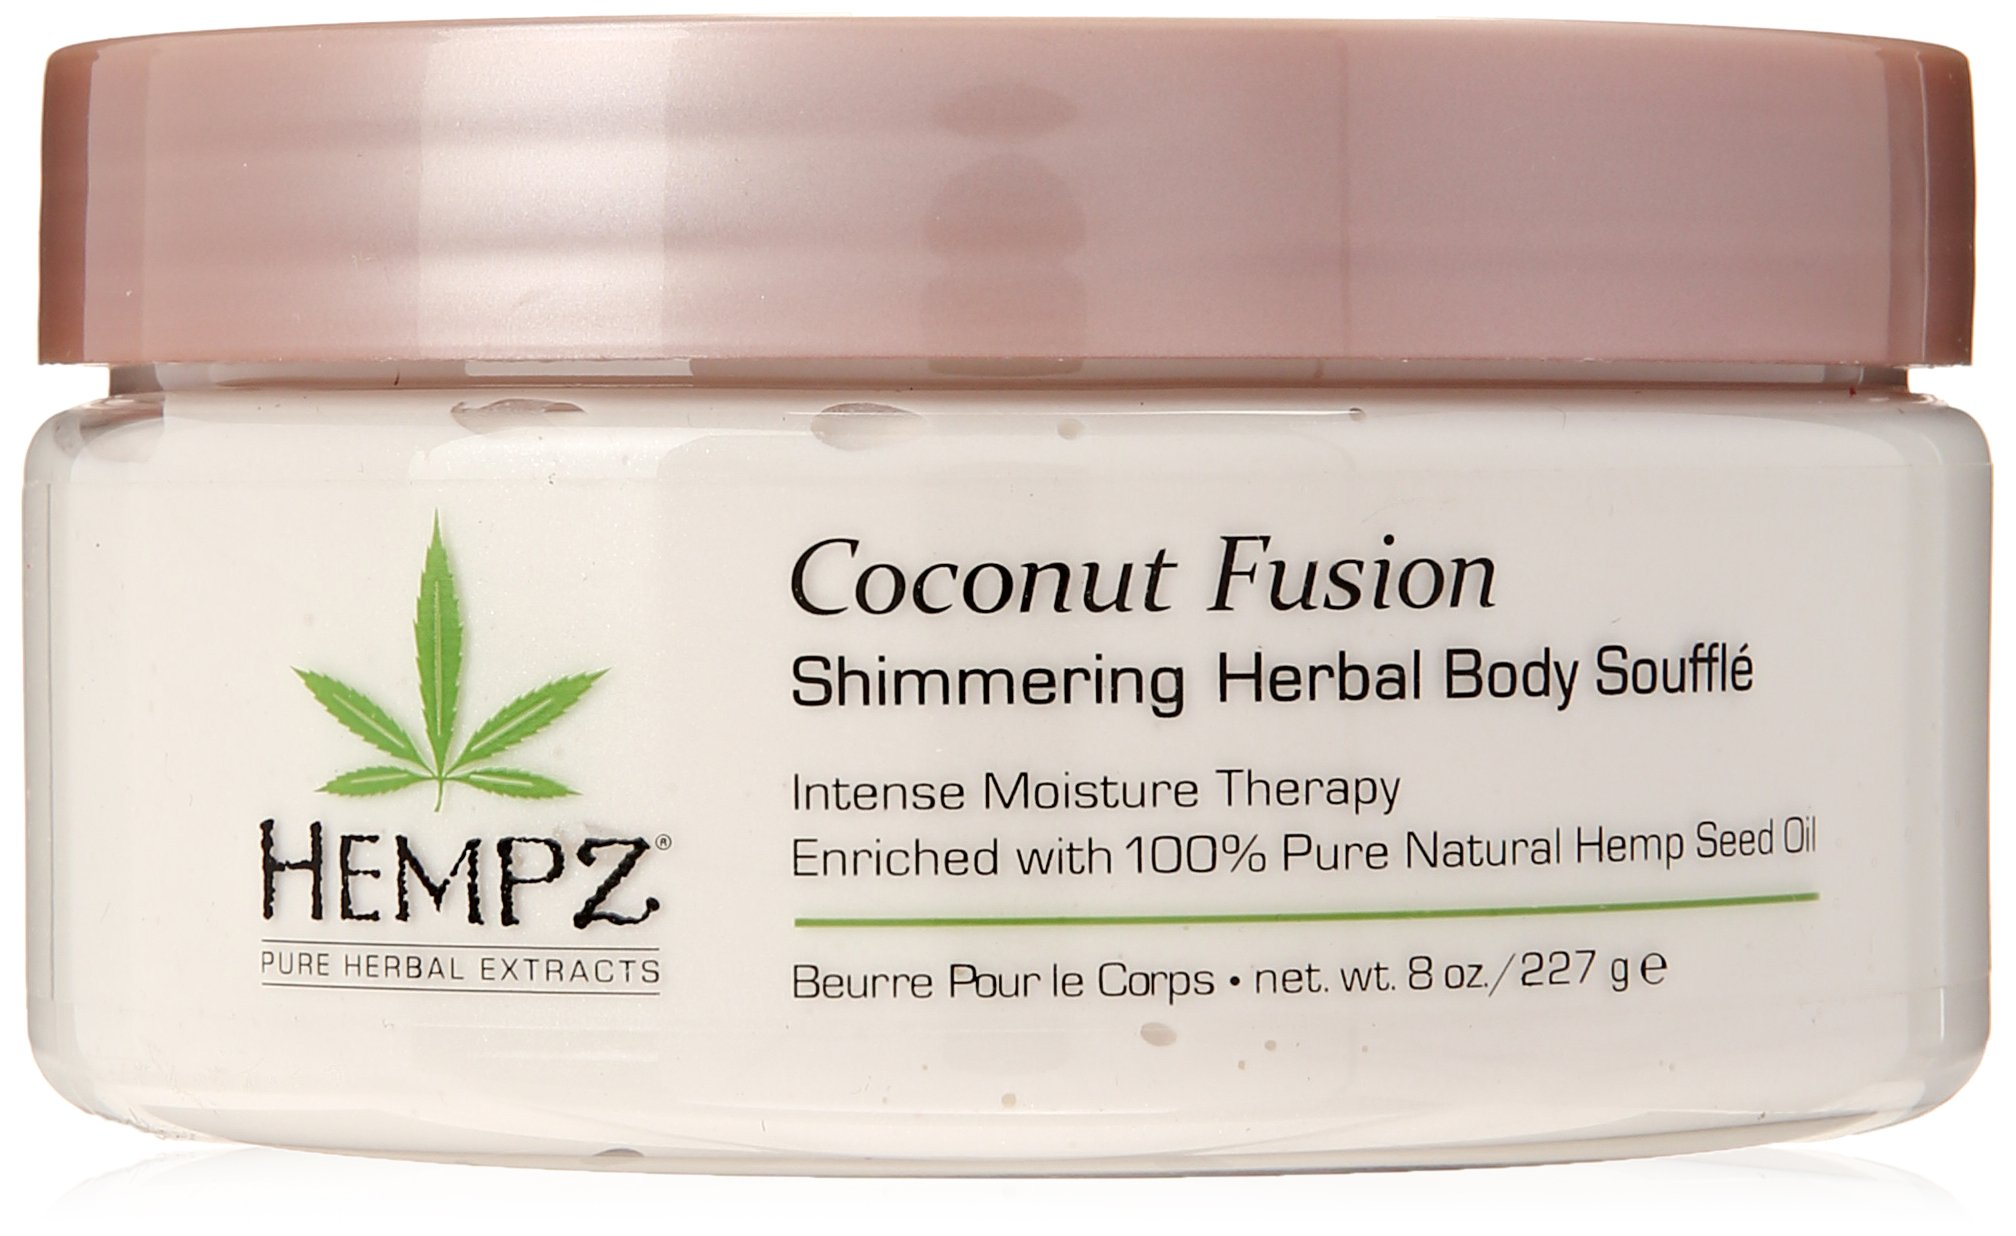 Hempz Coconut Fusion Herbal Shimmering Body Souffle, 8 Fluid Ounce